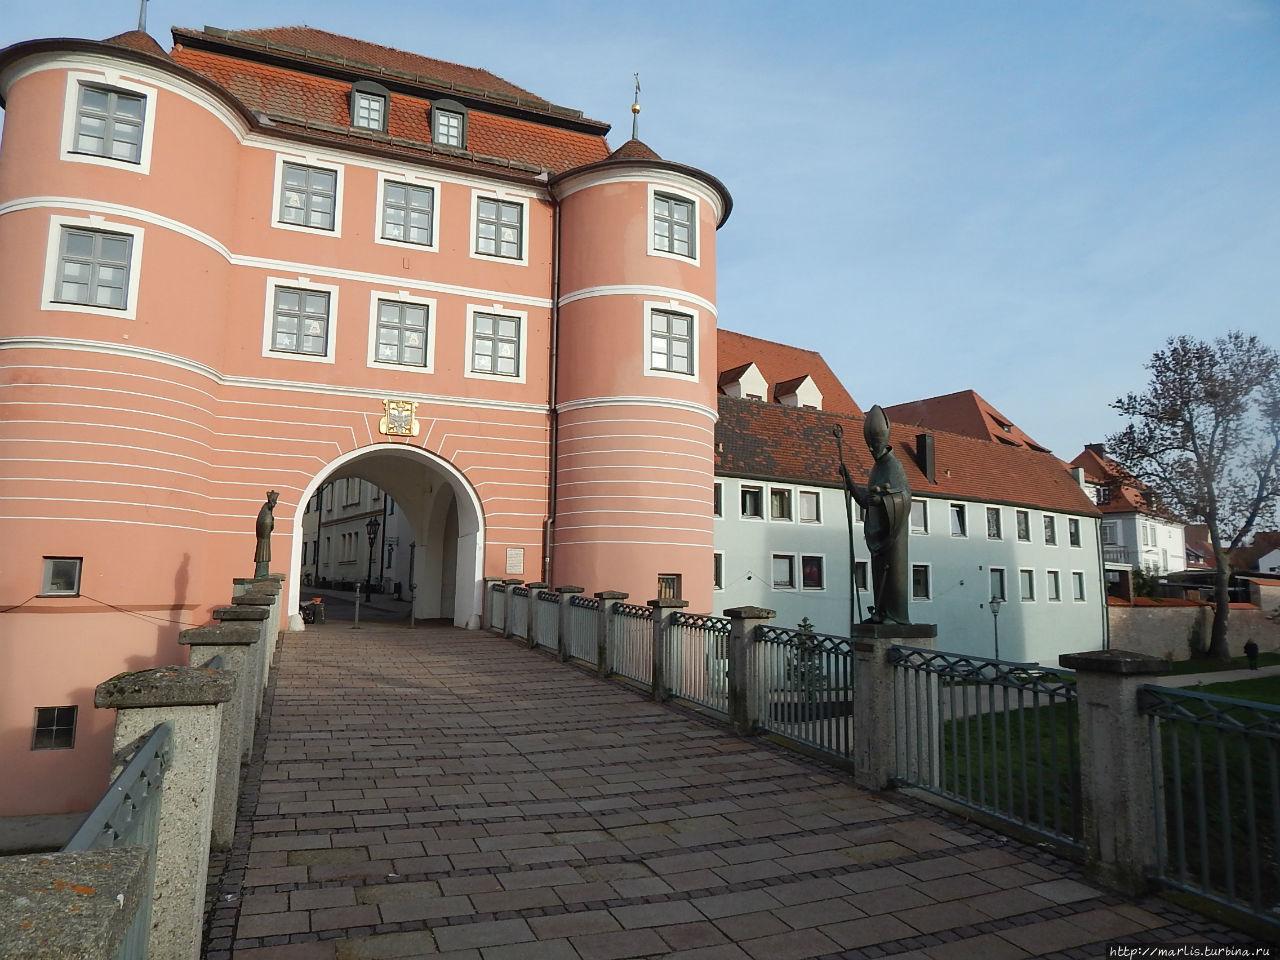 Мост через Вёрлиц и ворота Ридертор,  обьект N 4  на карте Донаувёрт, Германия